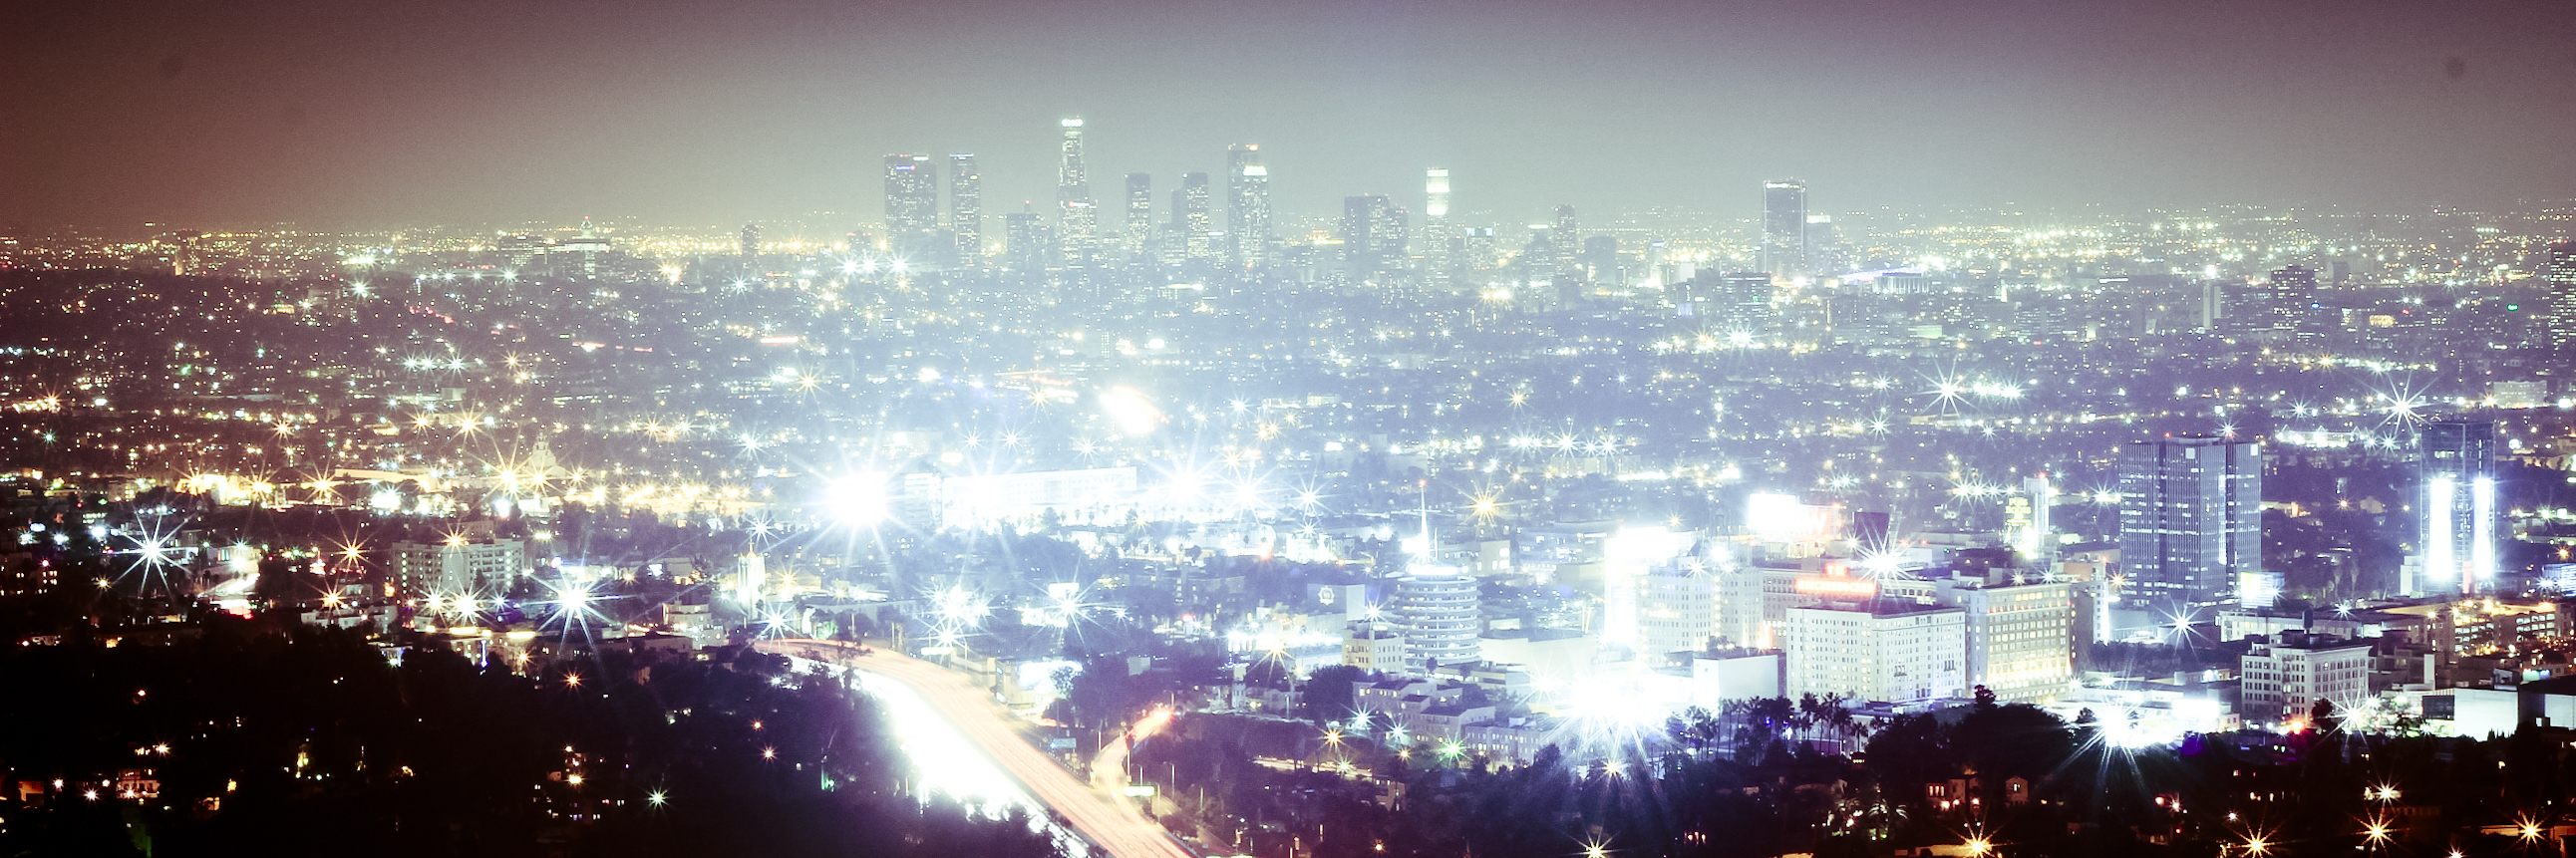 Los Angeles night... by anaelmasri